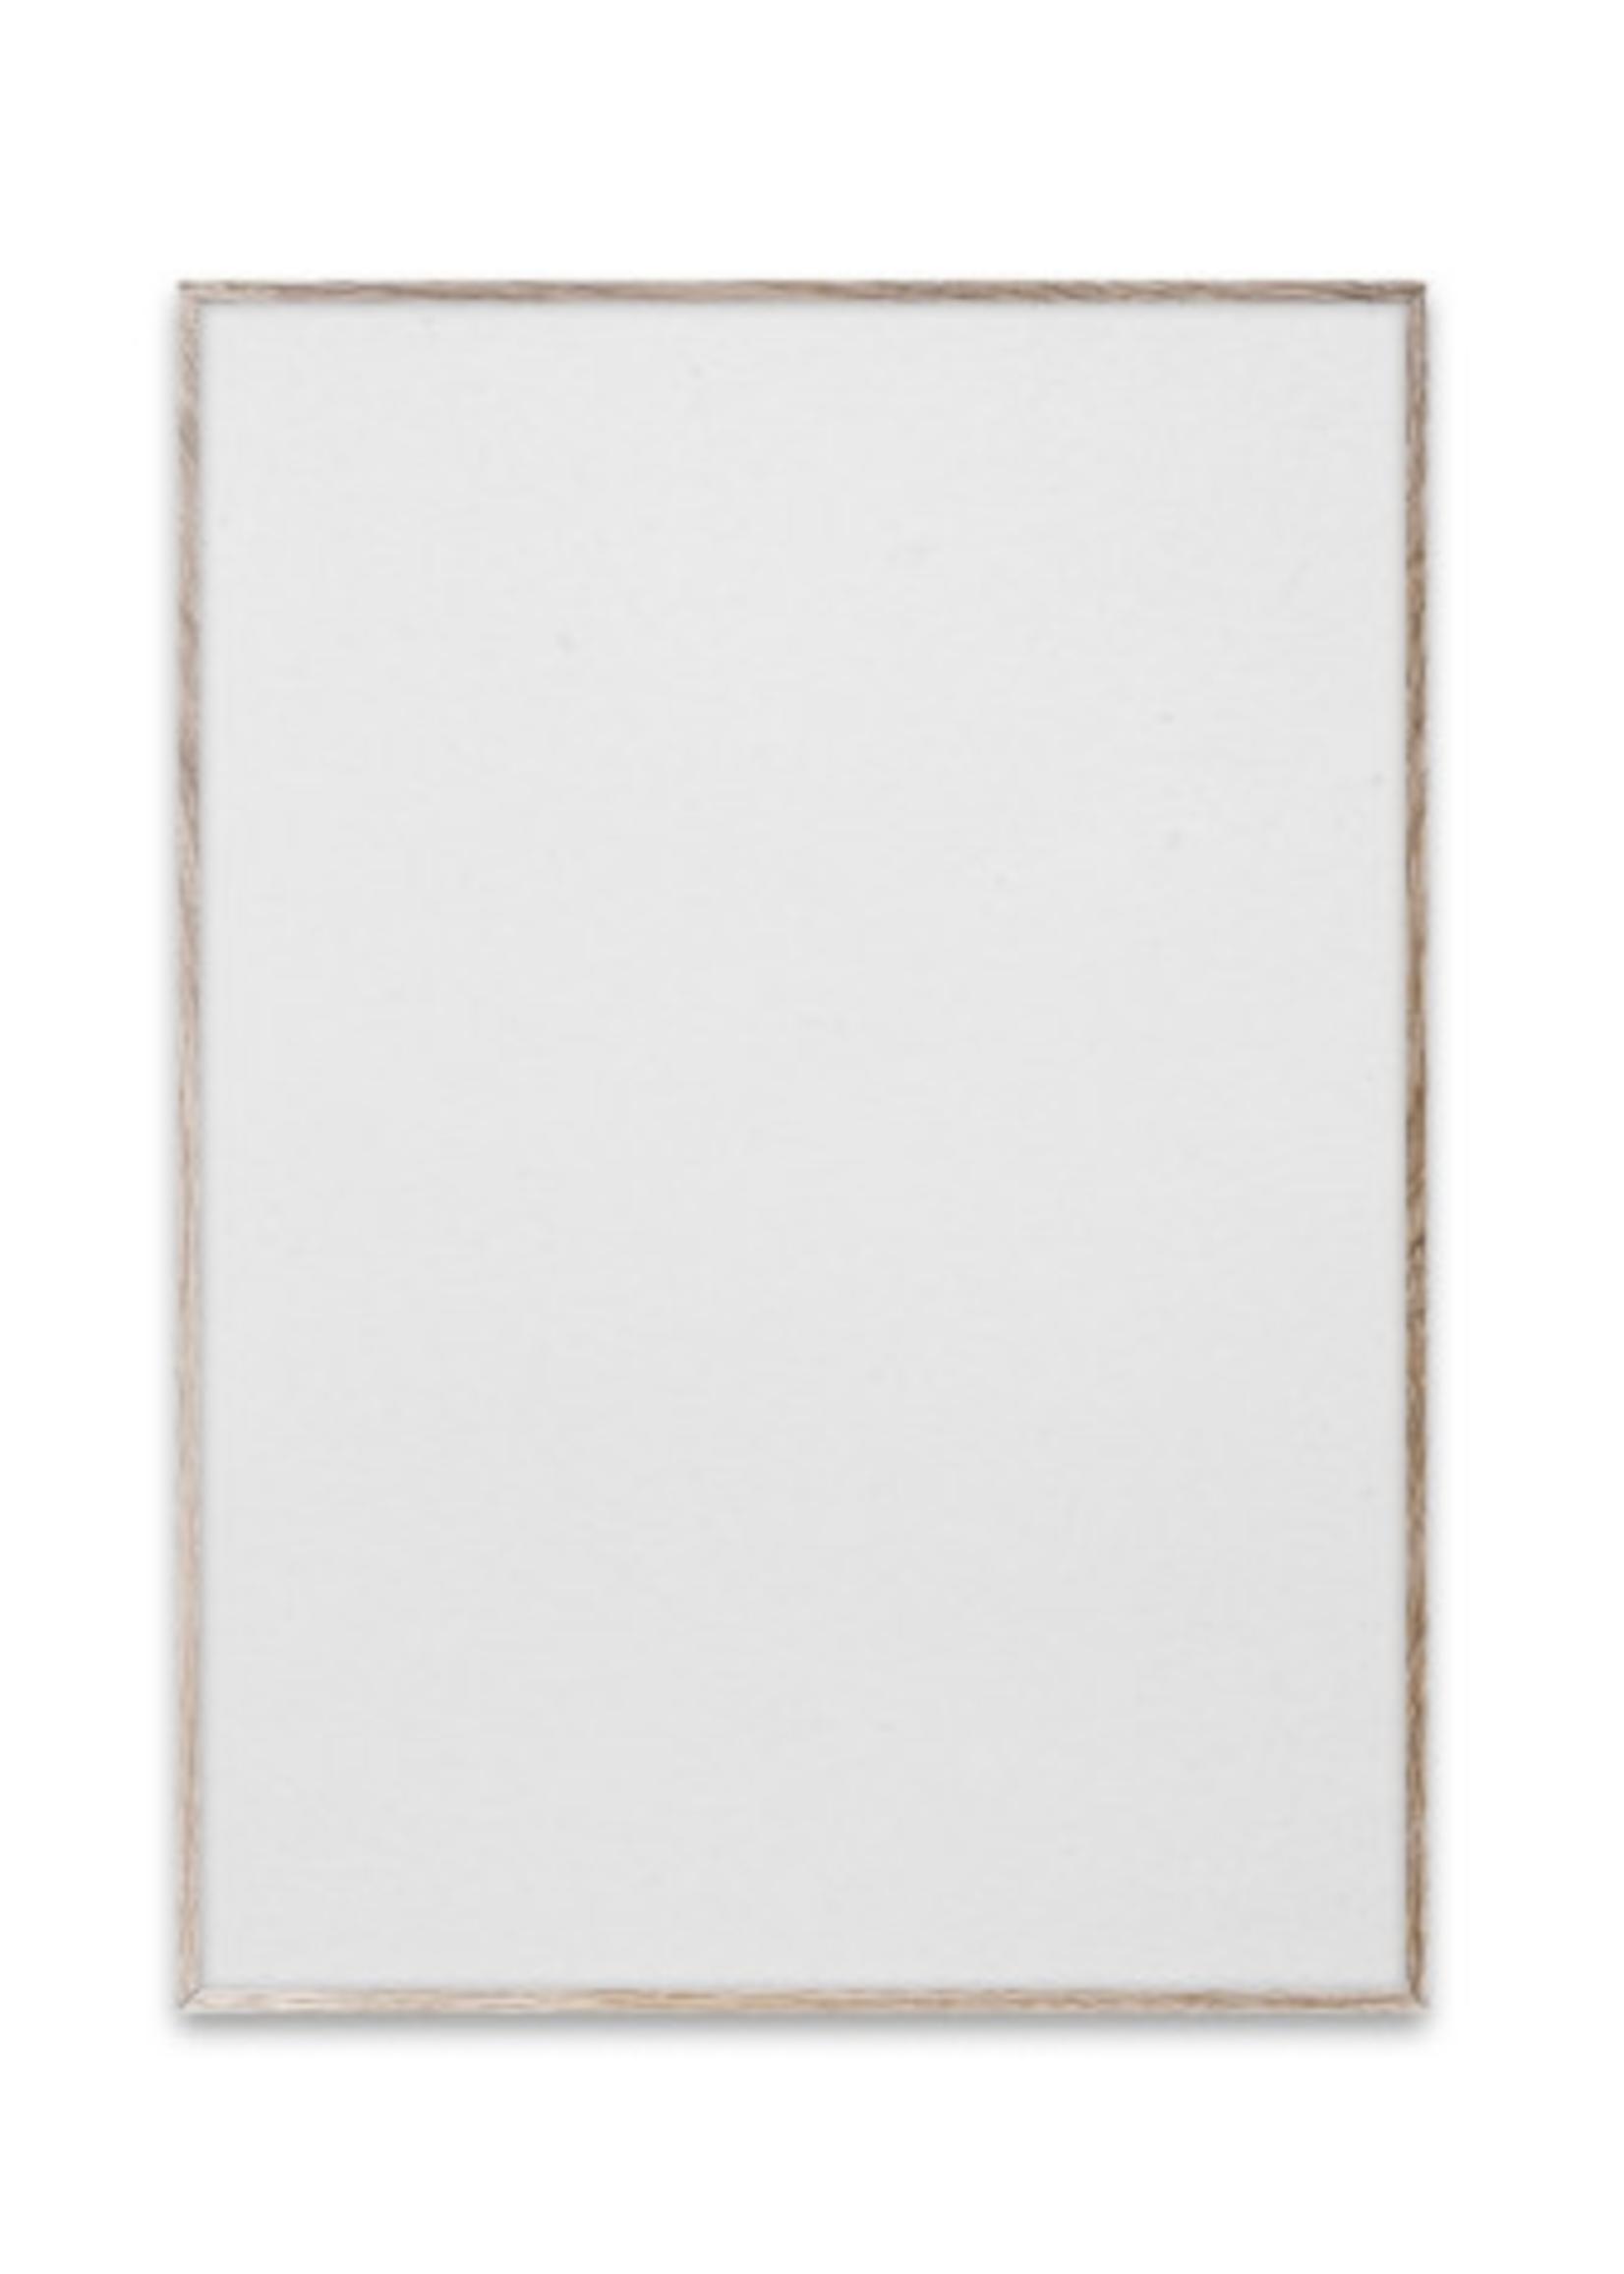 Paper Collective Regular Frame 50 x 70 cm